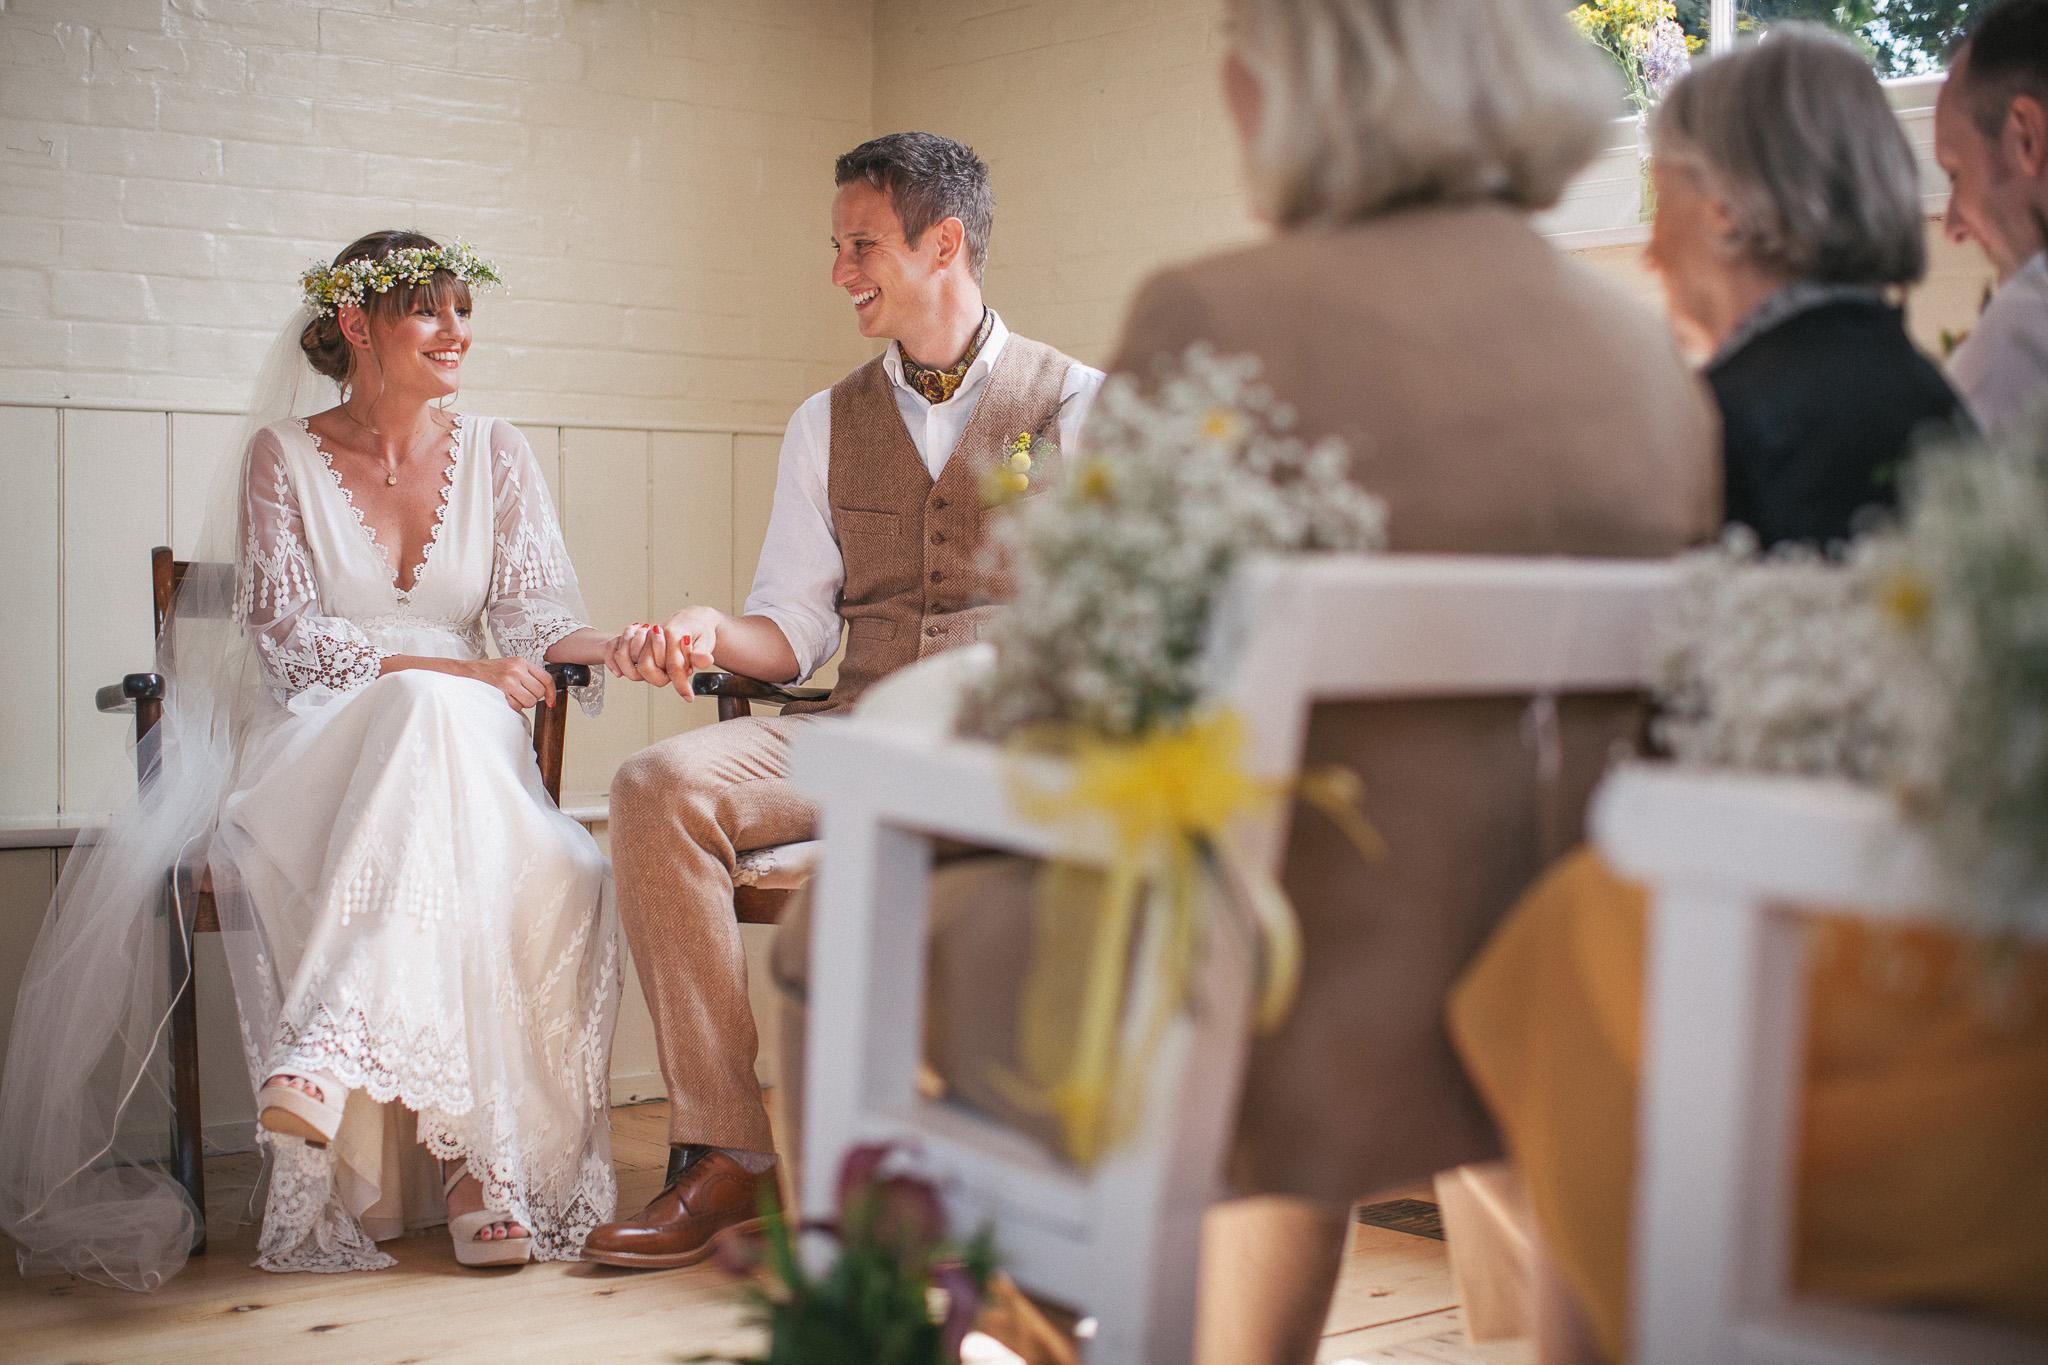 chantry_sussex_barn_wedding_309.jpg